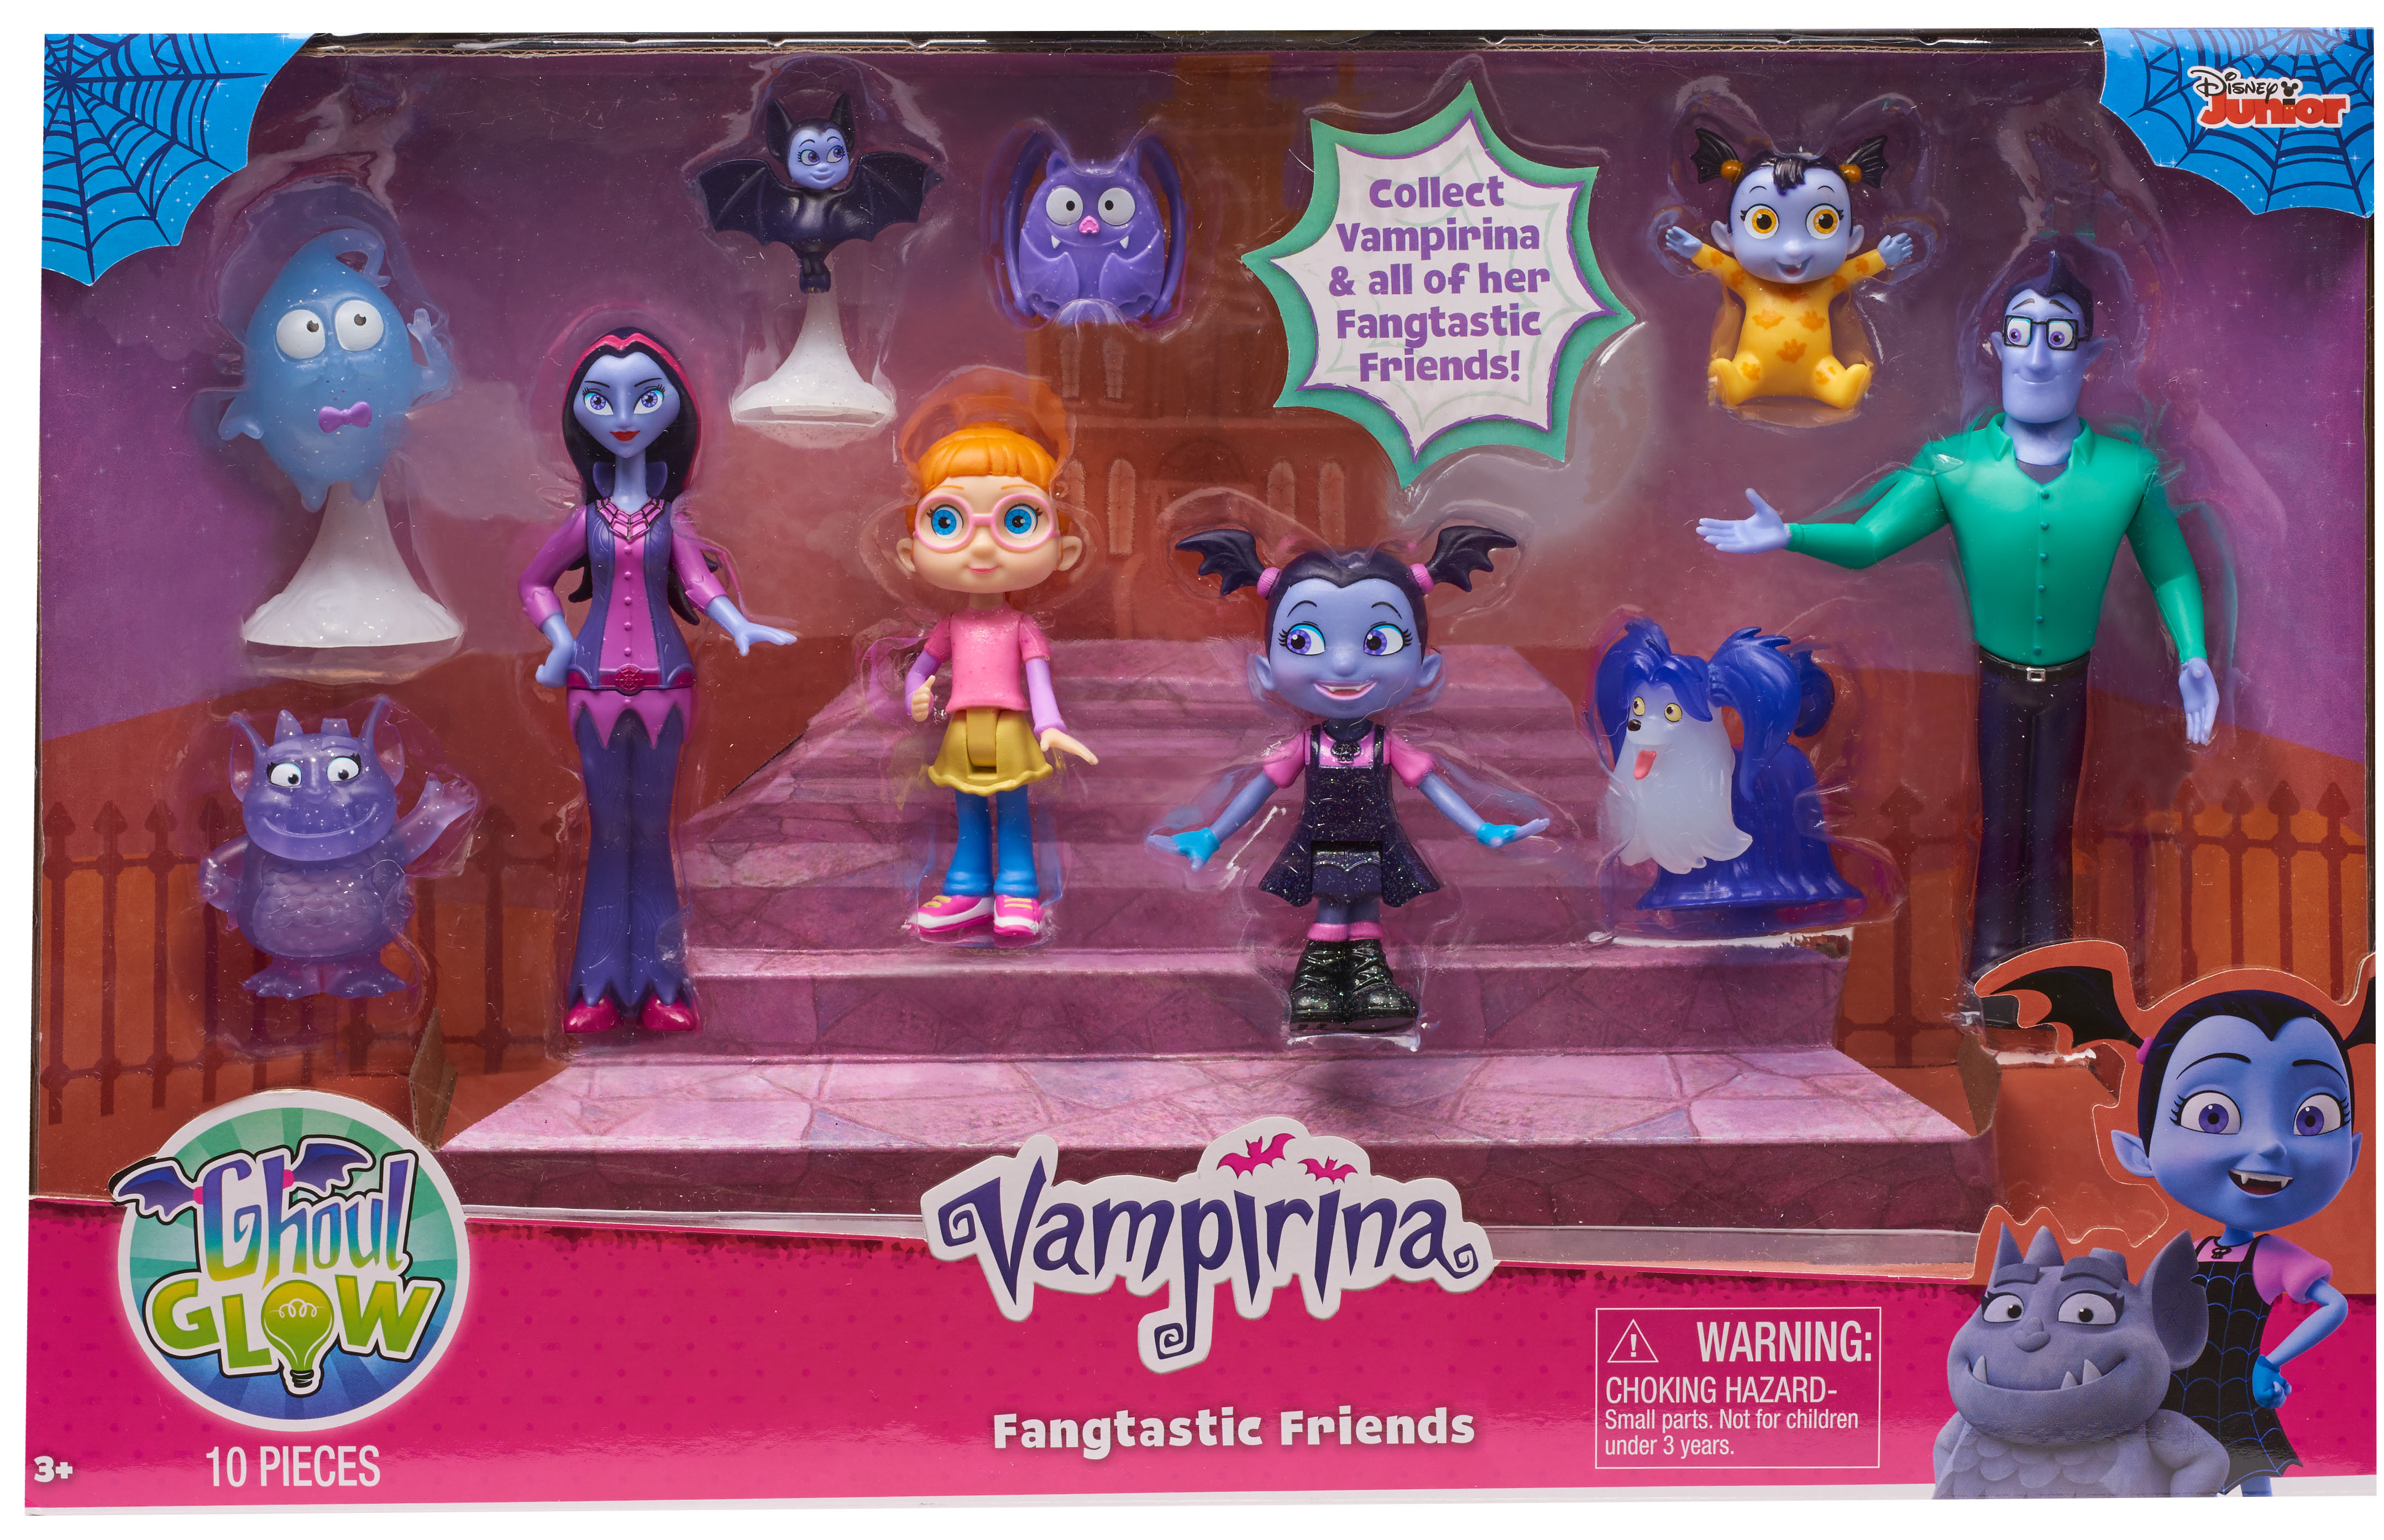 ee05e566980 Vampirina Fangtastic Friends Set - Walmart.com